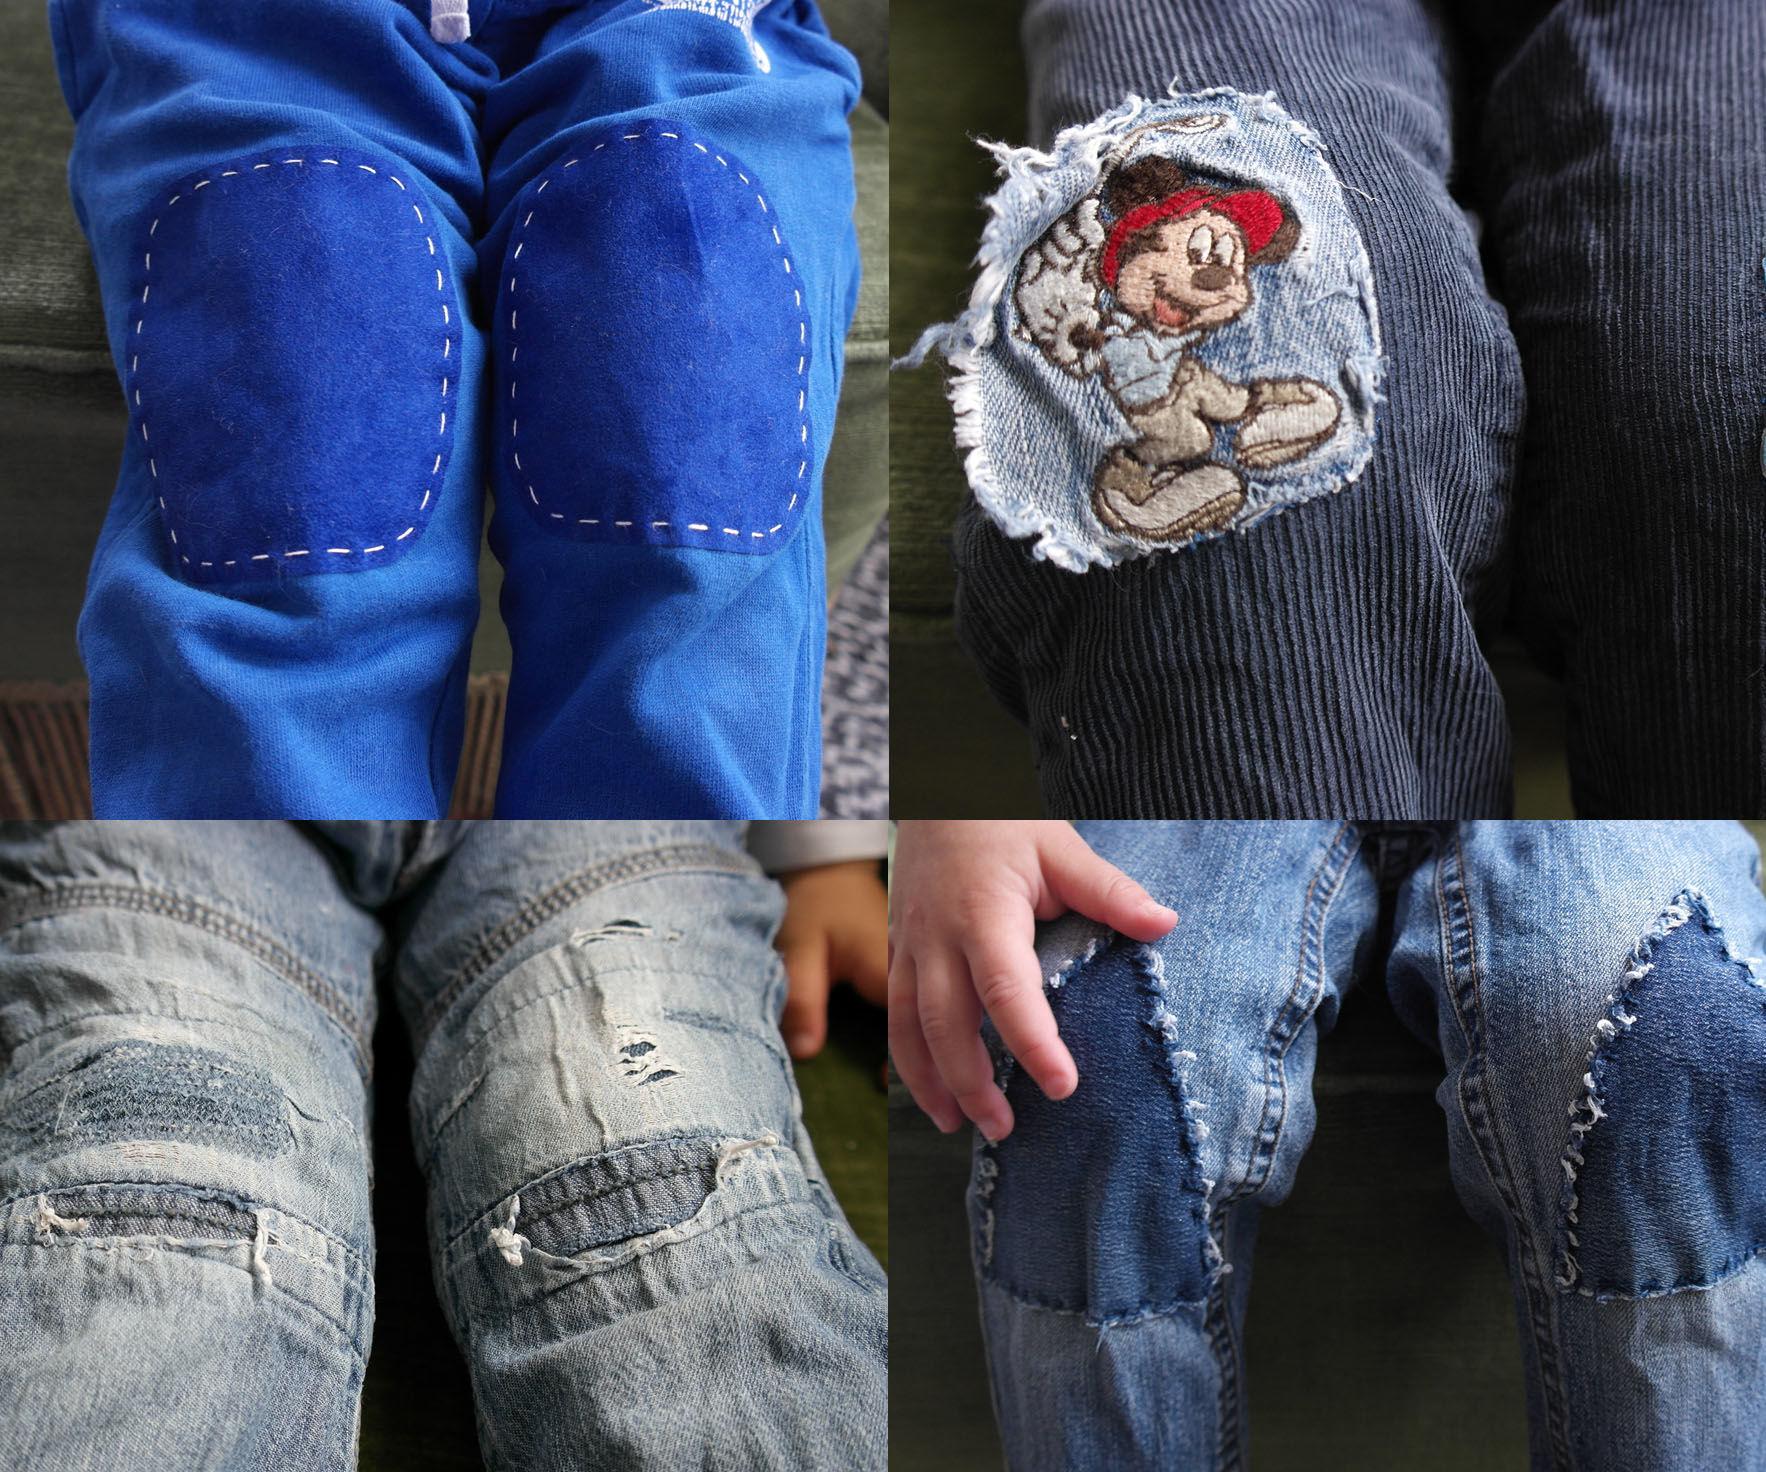 Patching Up Broken Kids-pants.